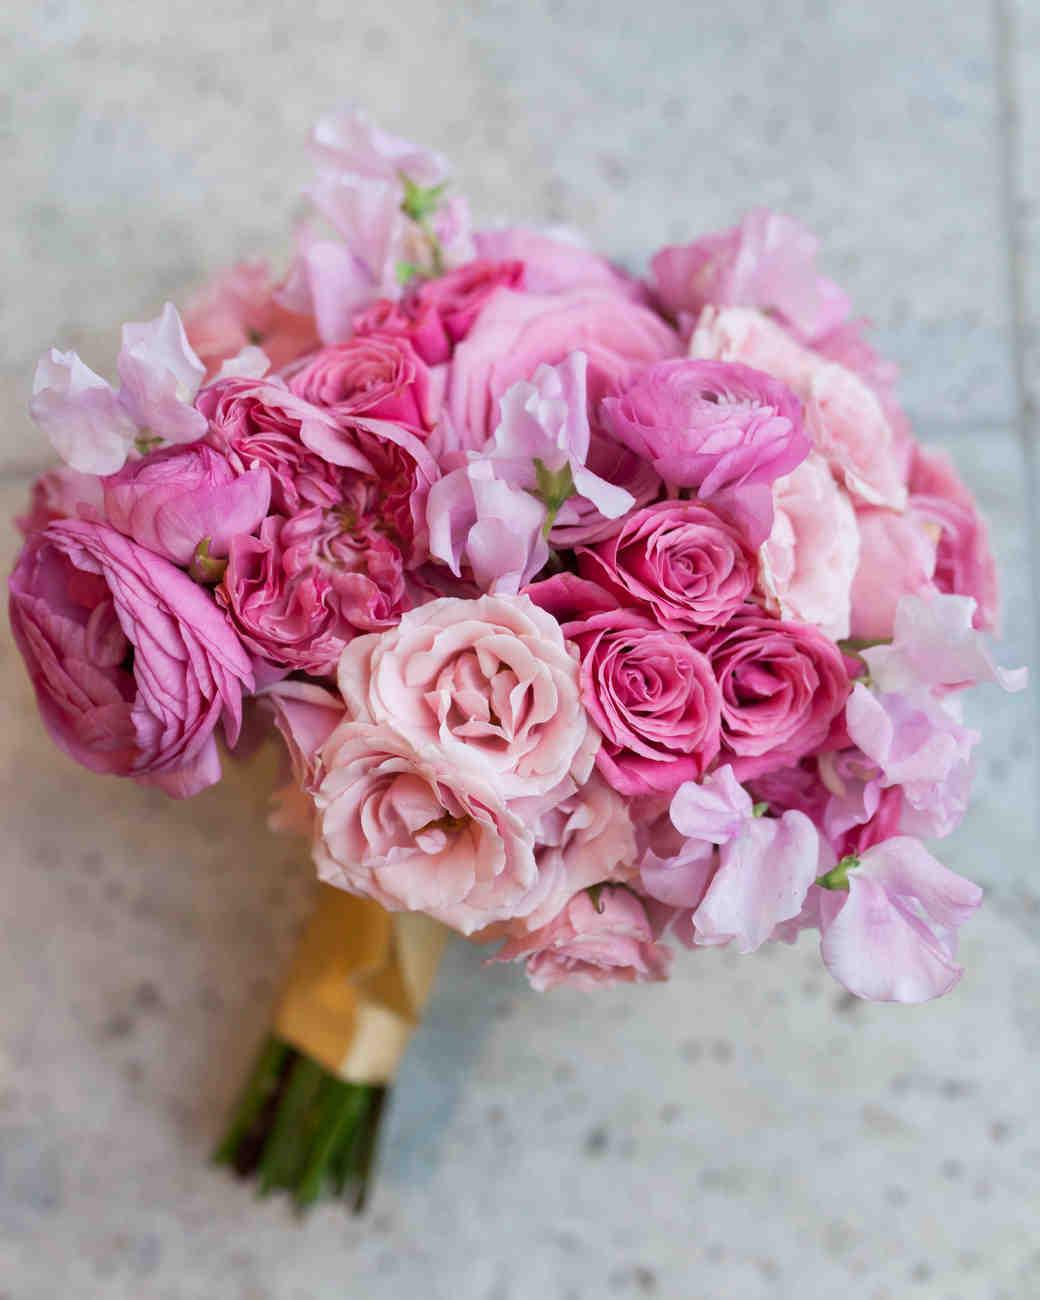 Rose, ranunculus and sweet pea bouquet. Image by cadenceandeli.com.